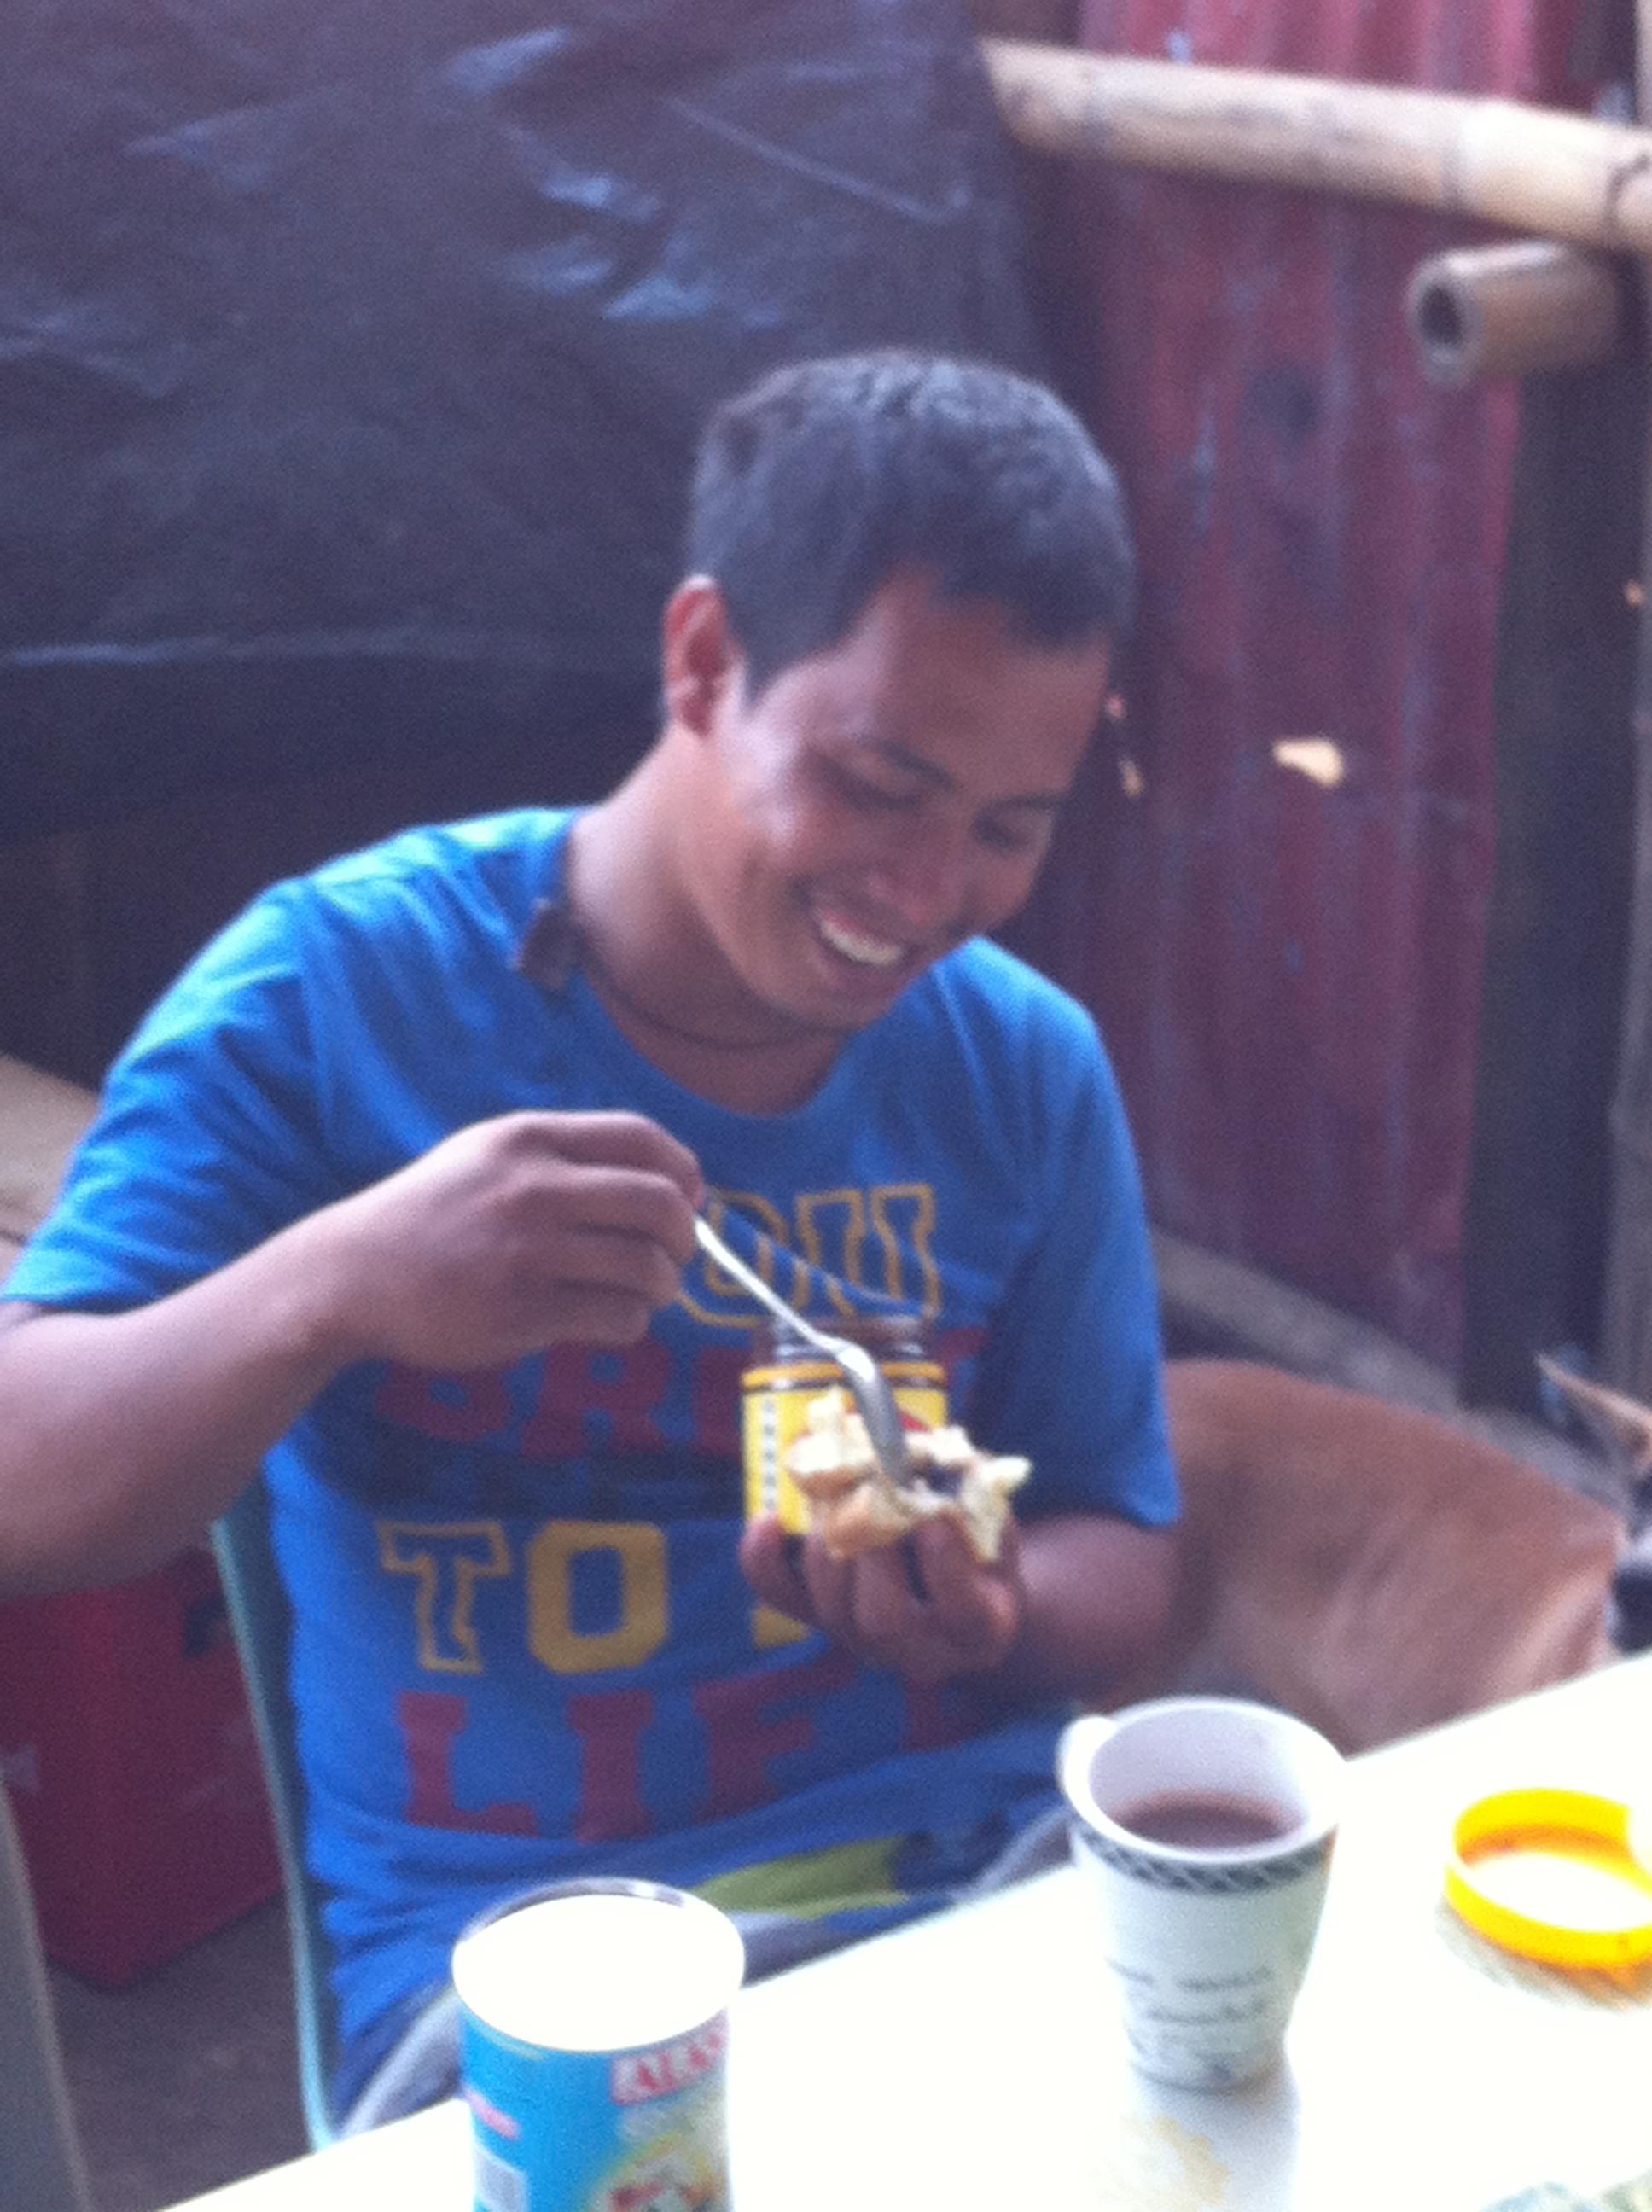 Jon Marc, the only Philippino who likes vegemite.